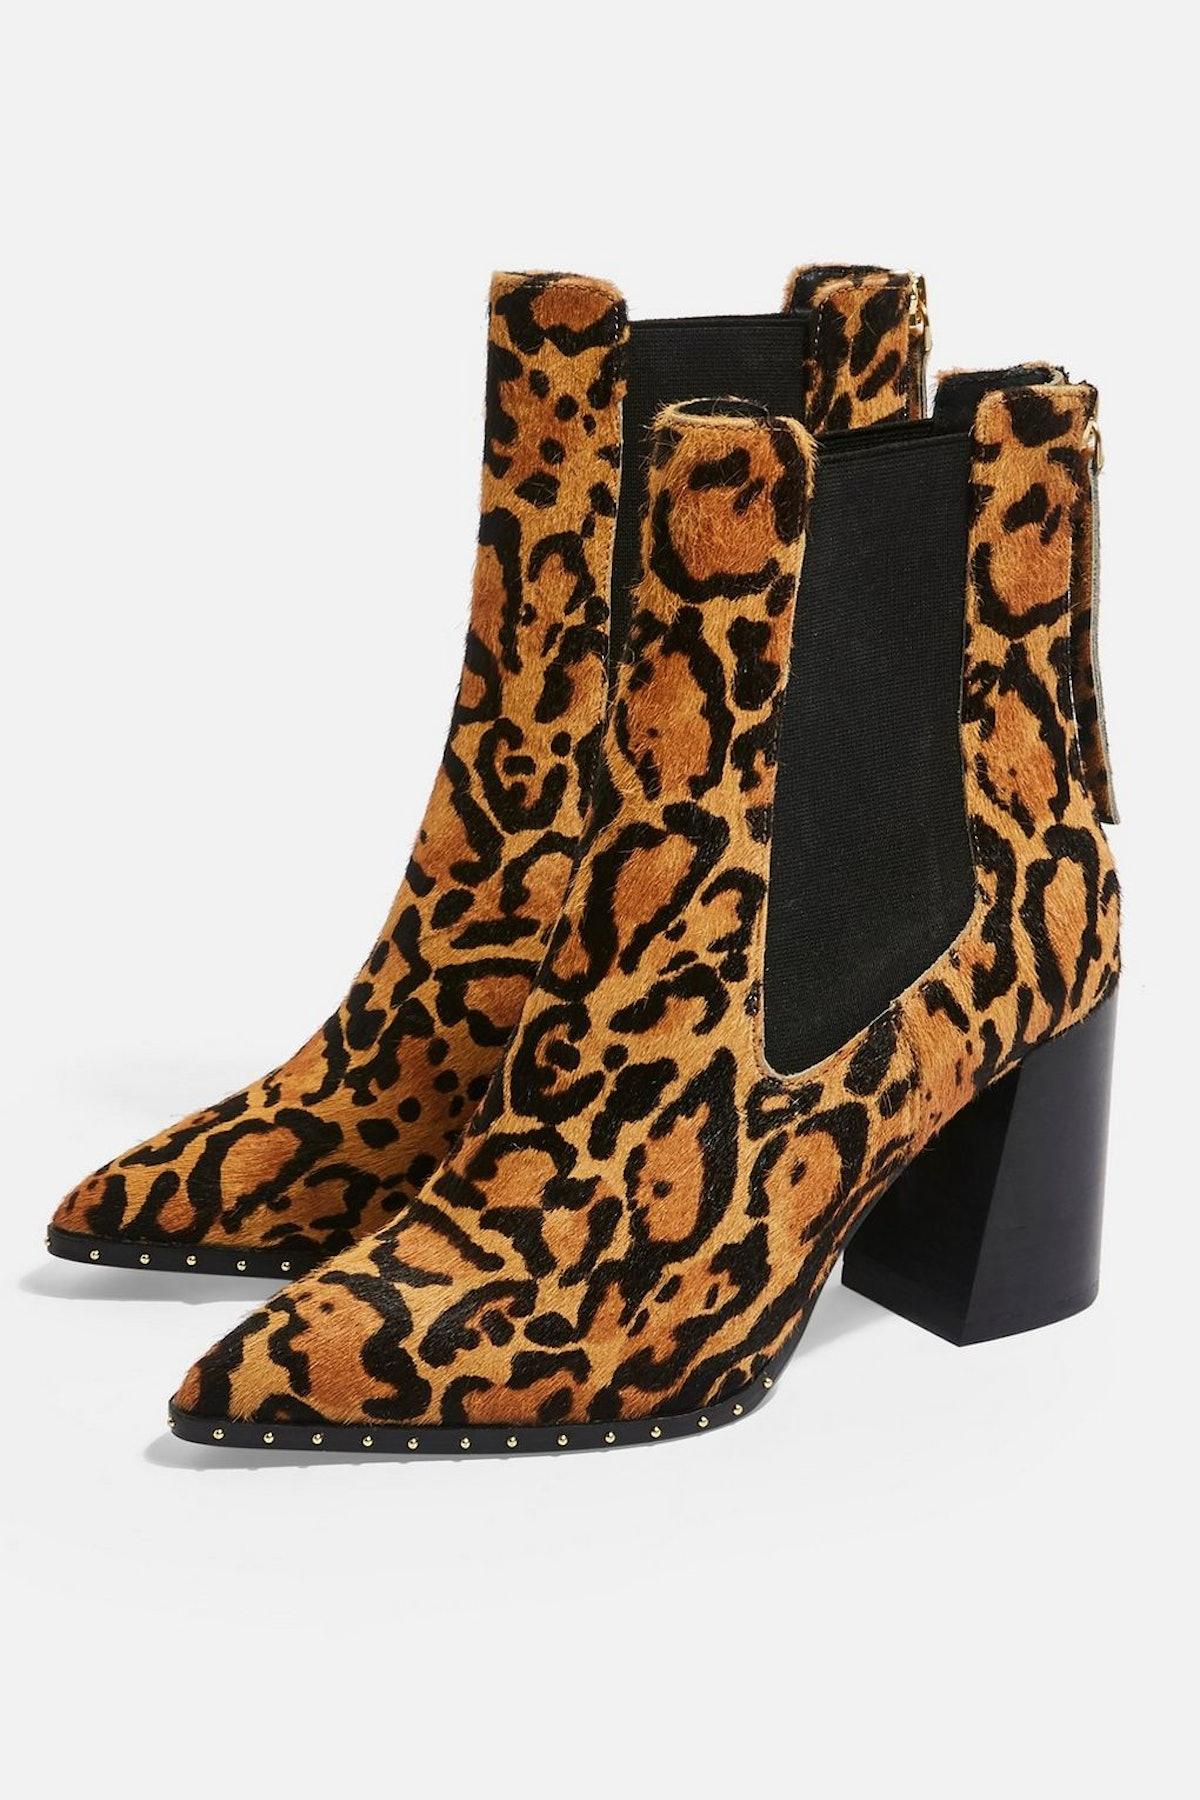 HARRISON Leopard High Heel Ankle Boots